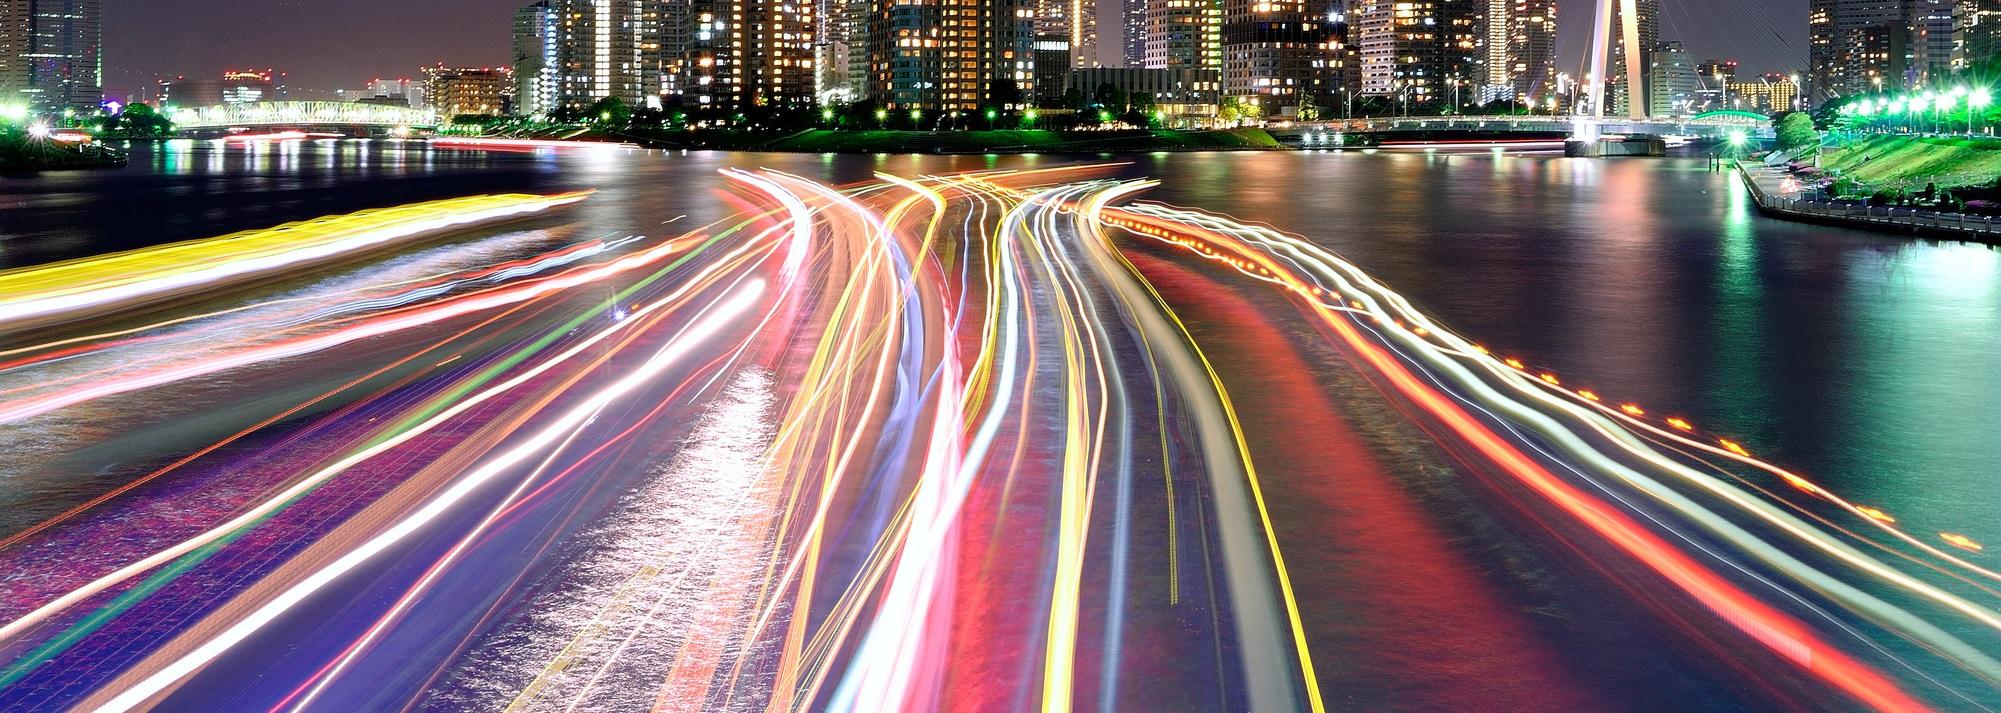 city-tokyo-japan-night-lights-houses-light-exposure